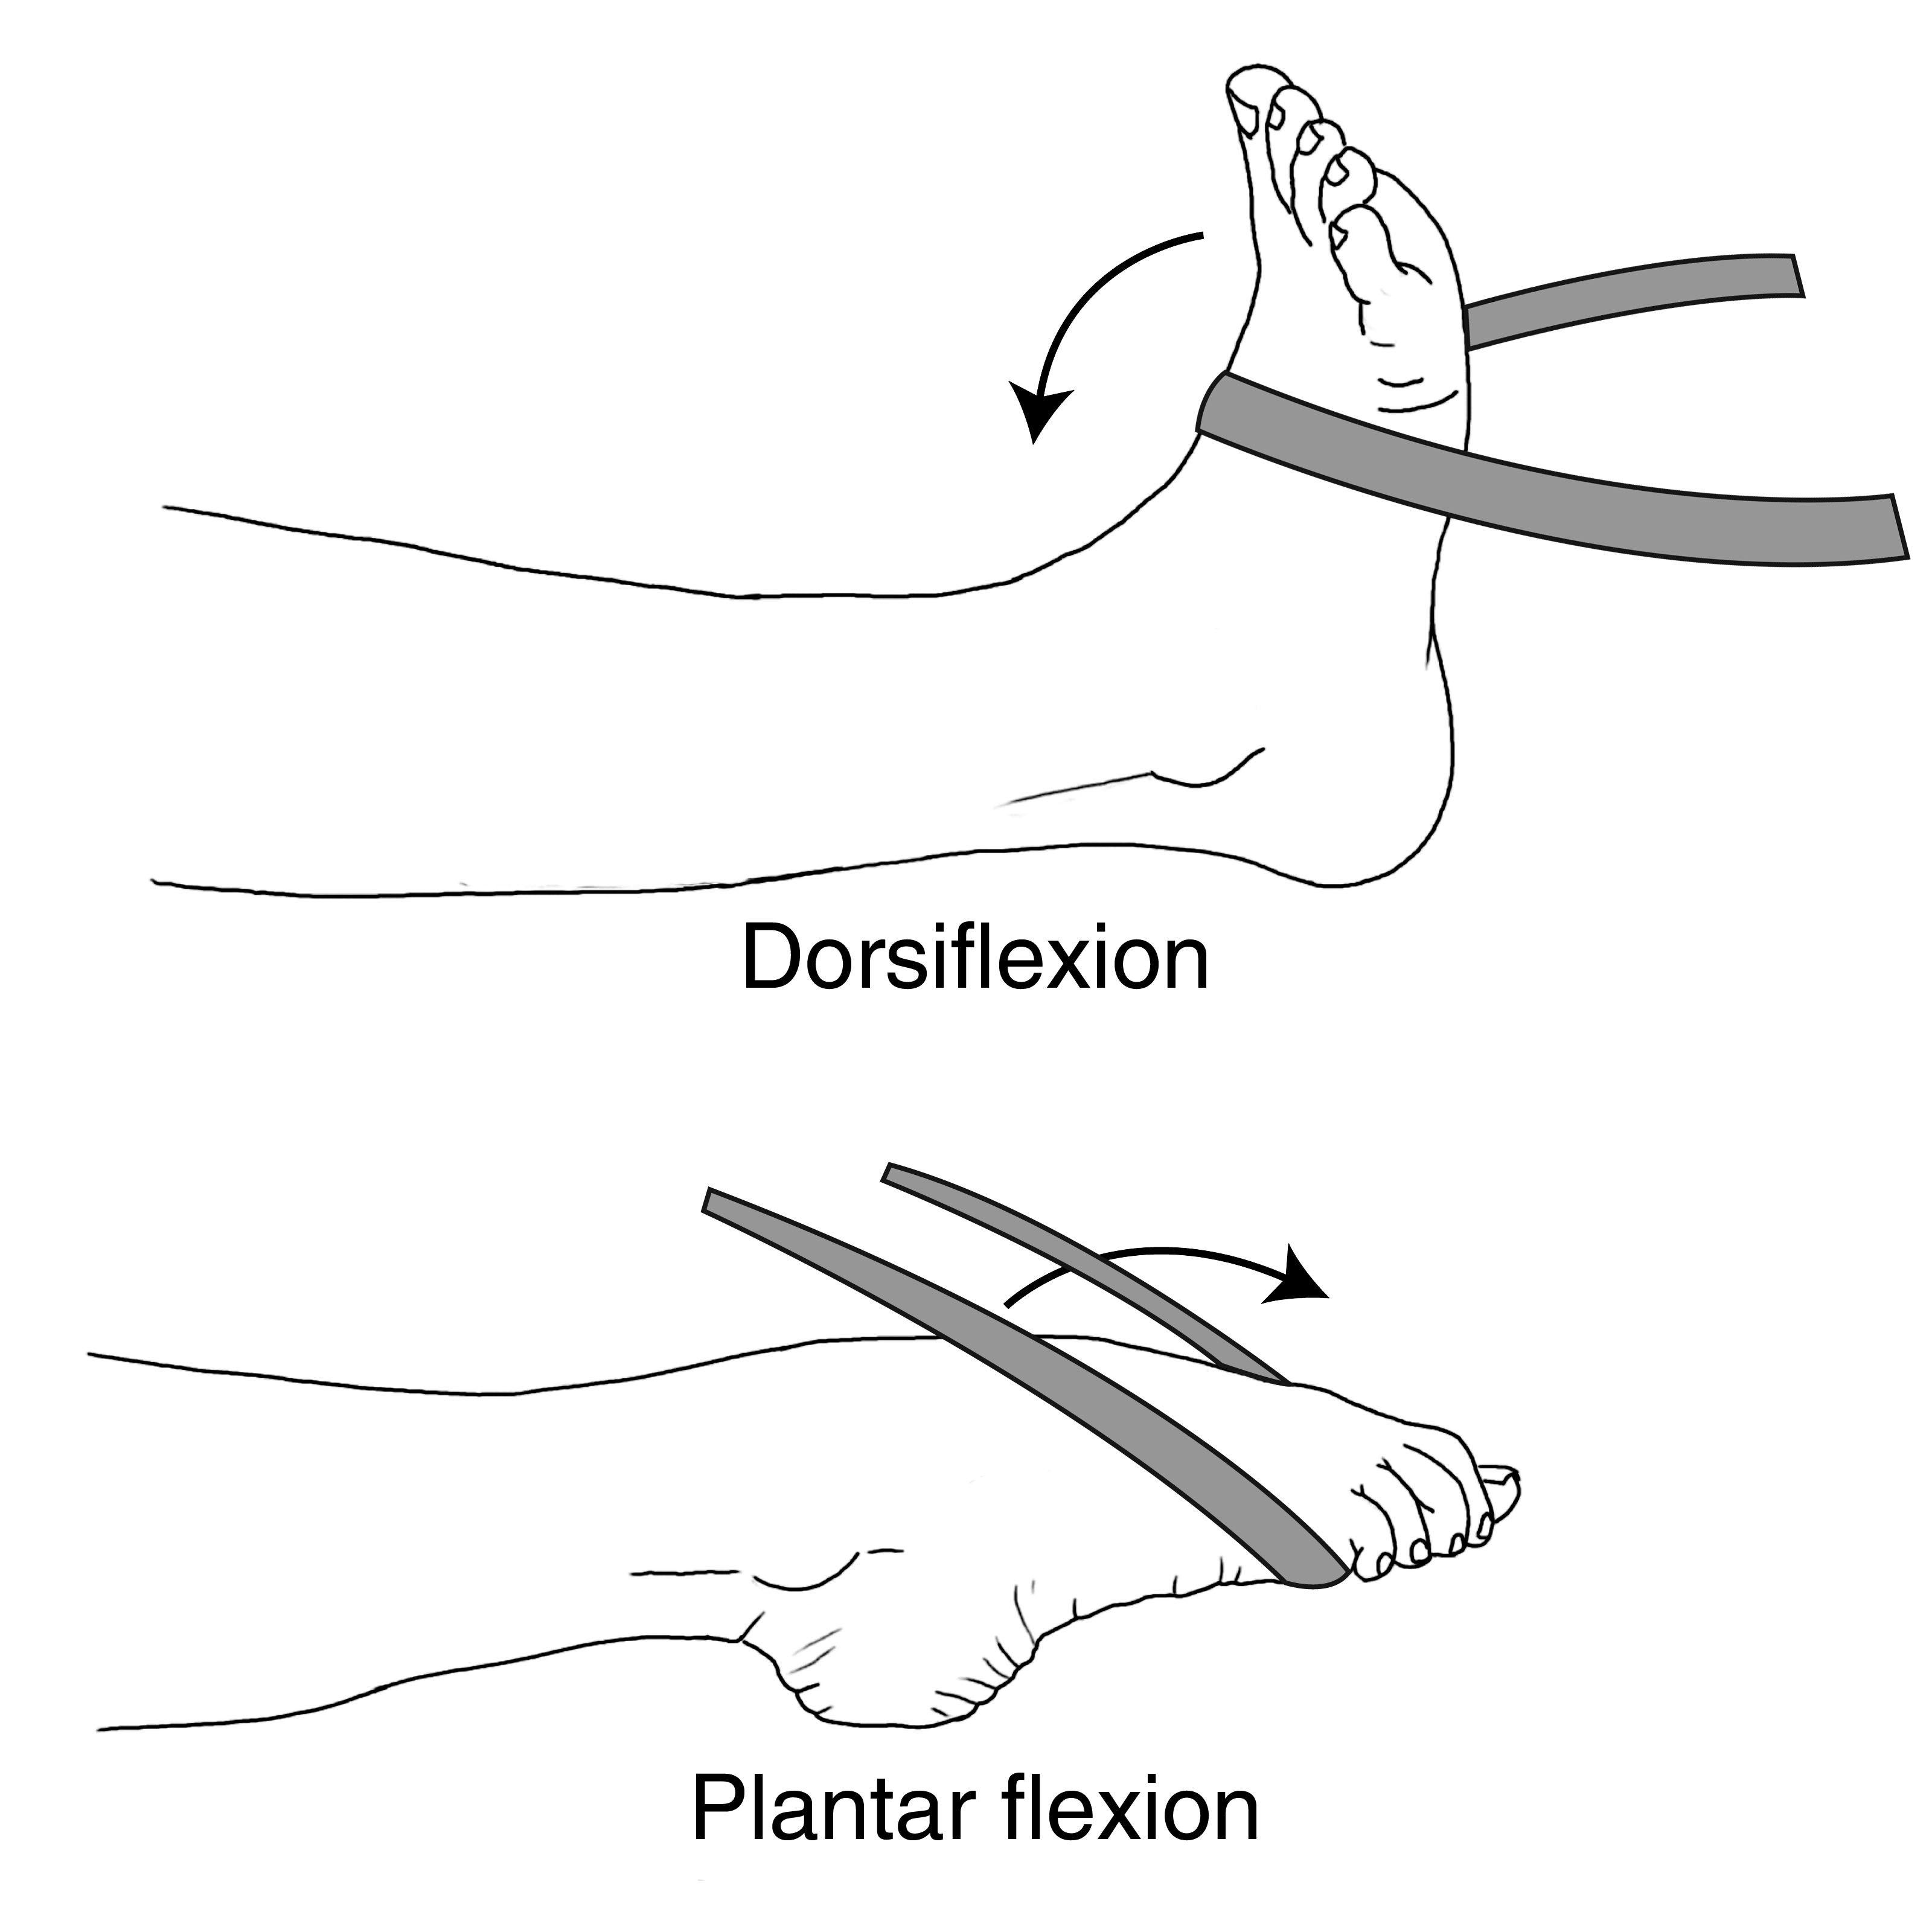 Ankle dorsiflexion/plantar flexion